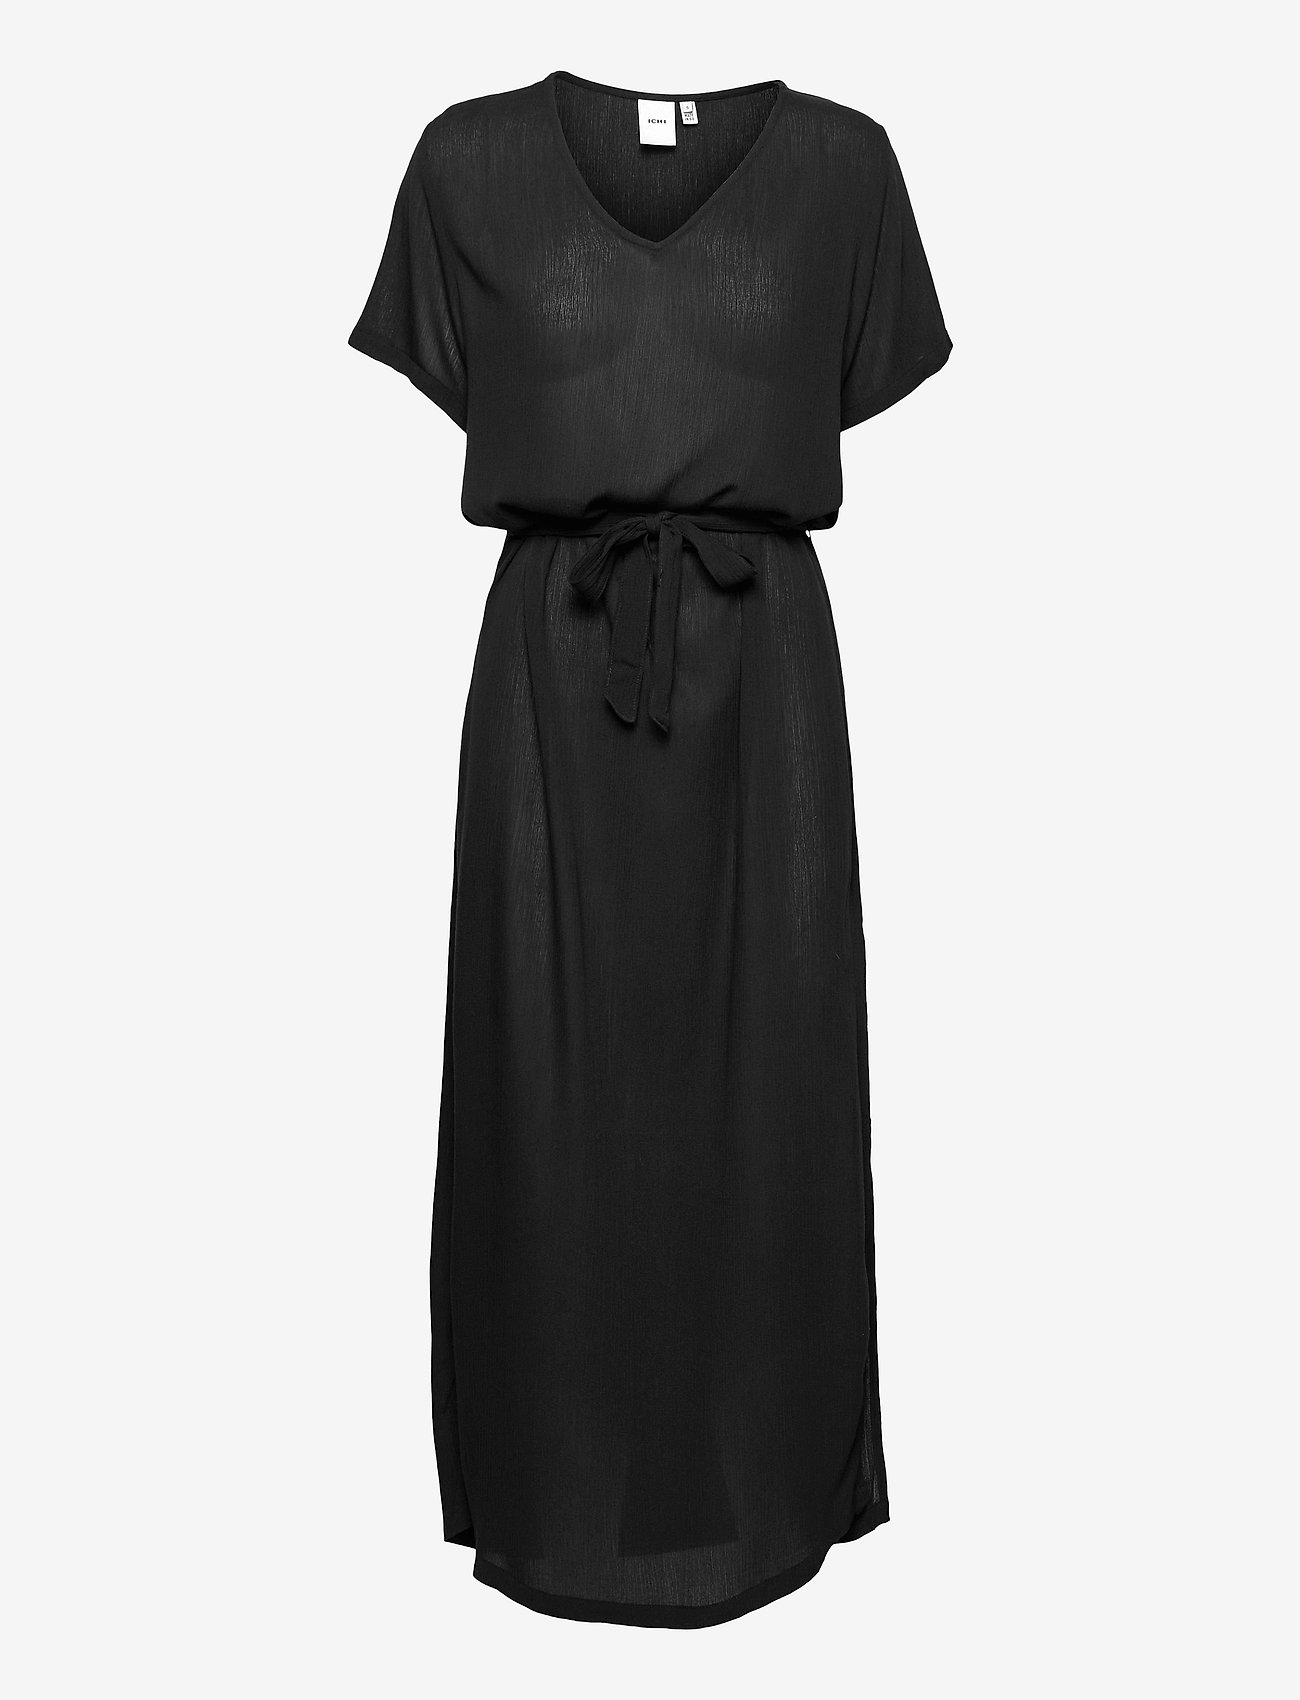 ICHI - IHMARRAKECH SO DR4 - maxi dresses - black - 0